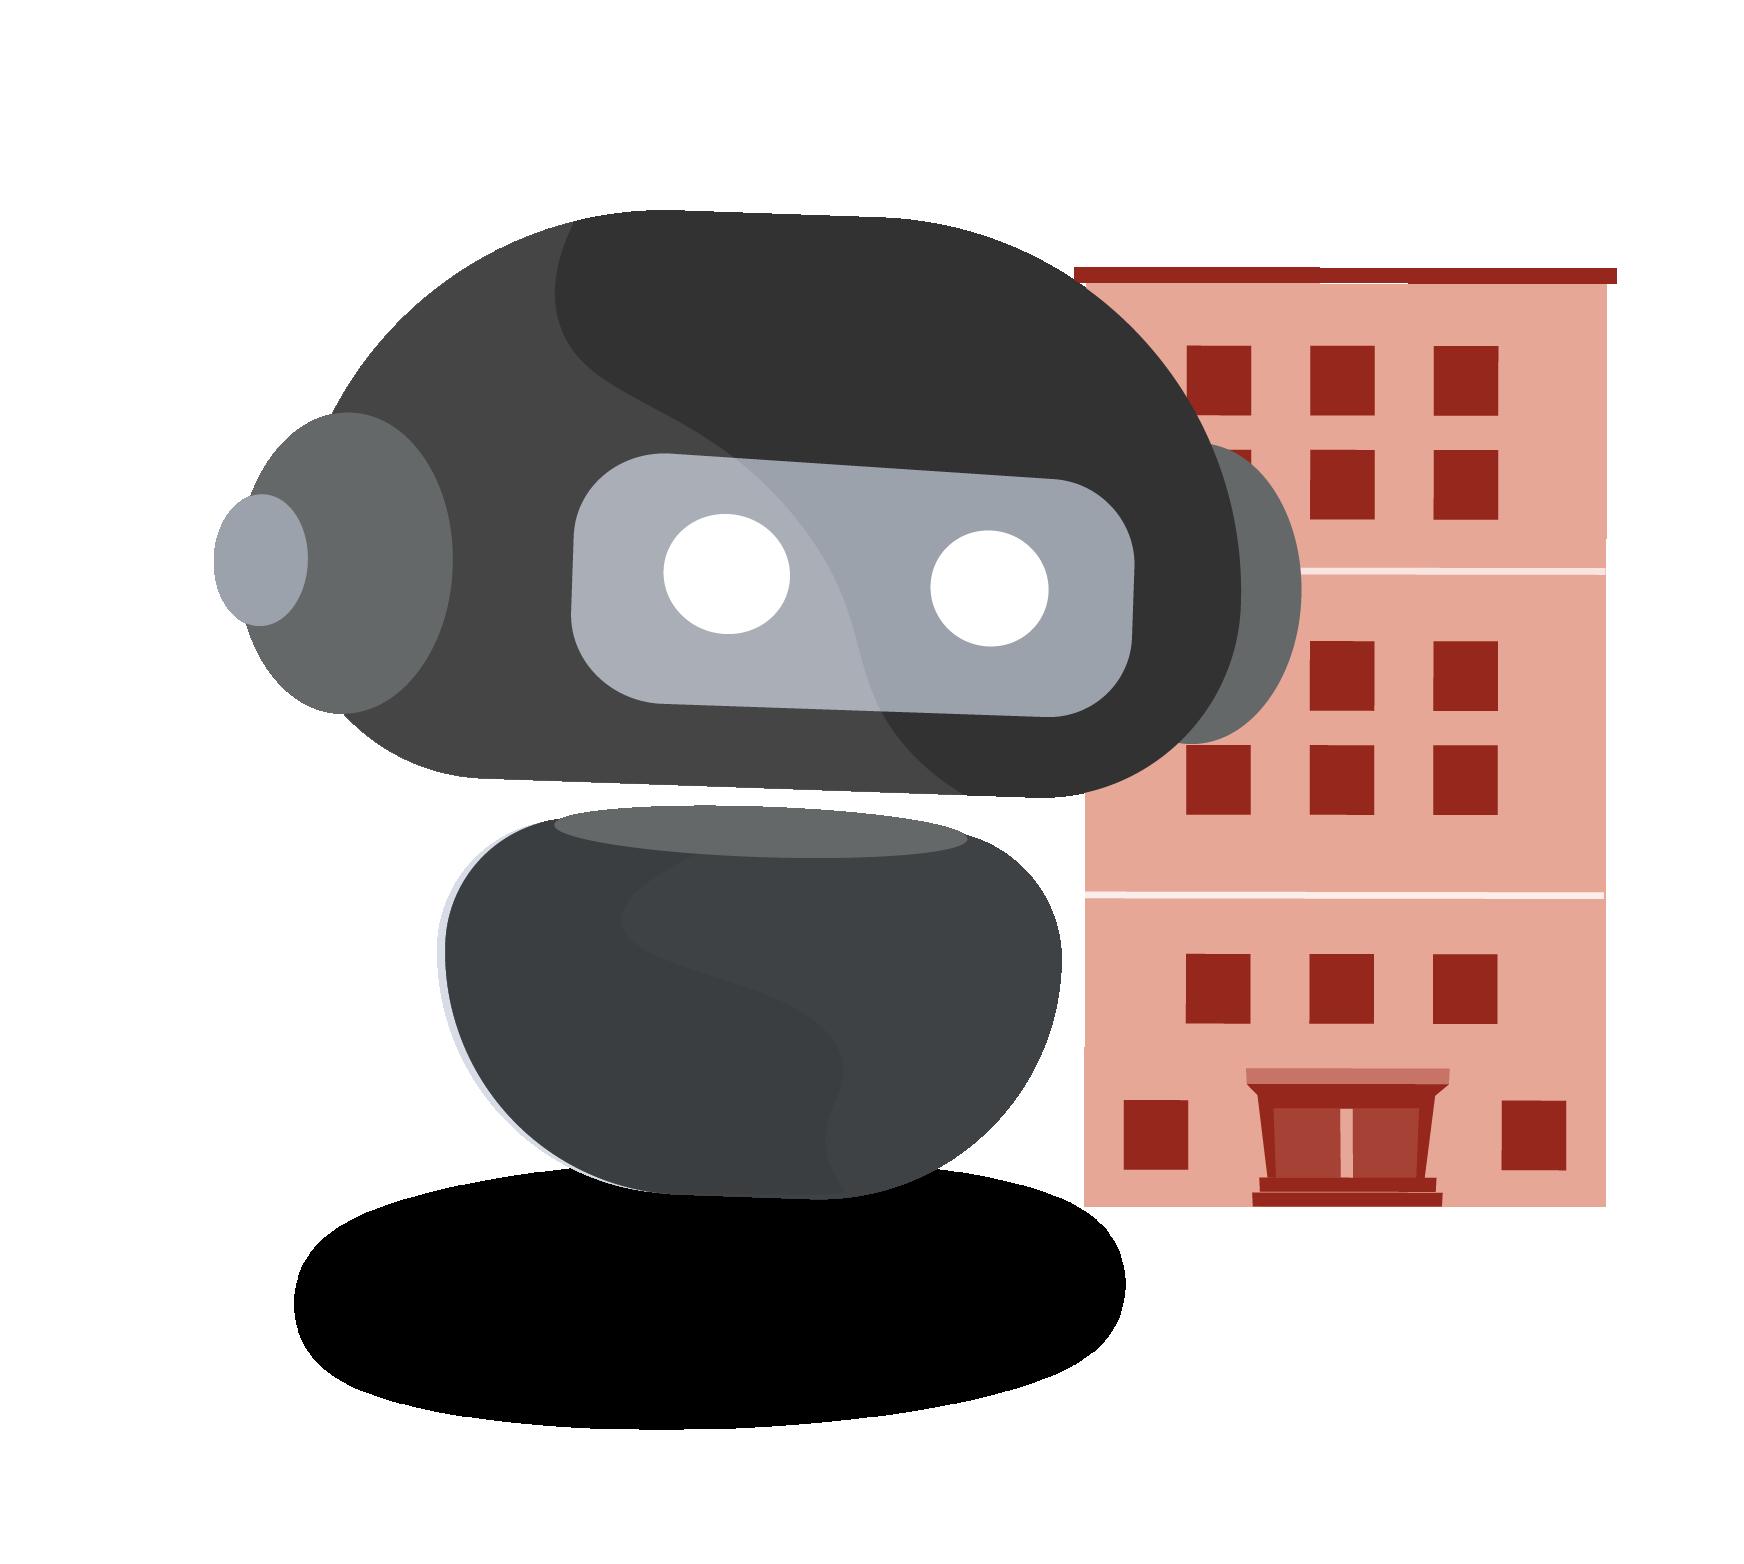 bot organization